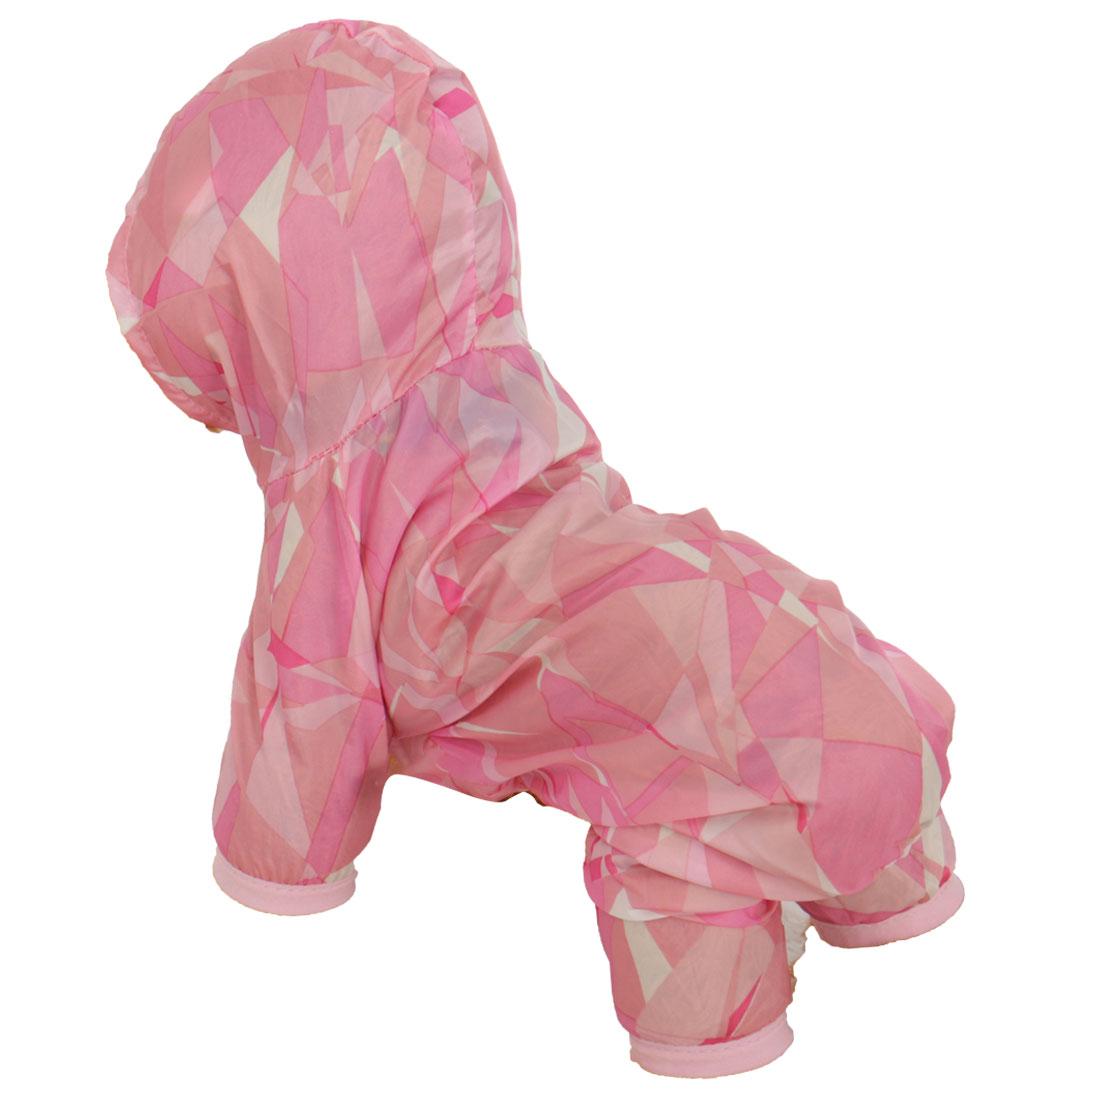 Pet Dog Raincoat Polyester Pet Puppy Water-resistant Rainwear Pink L